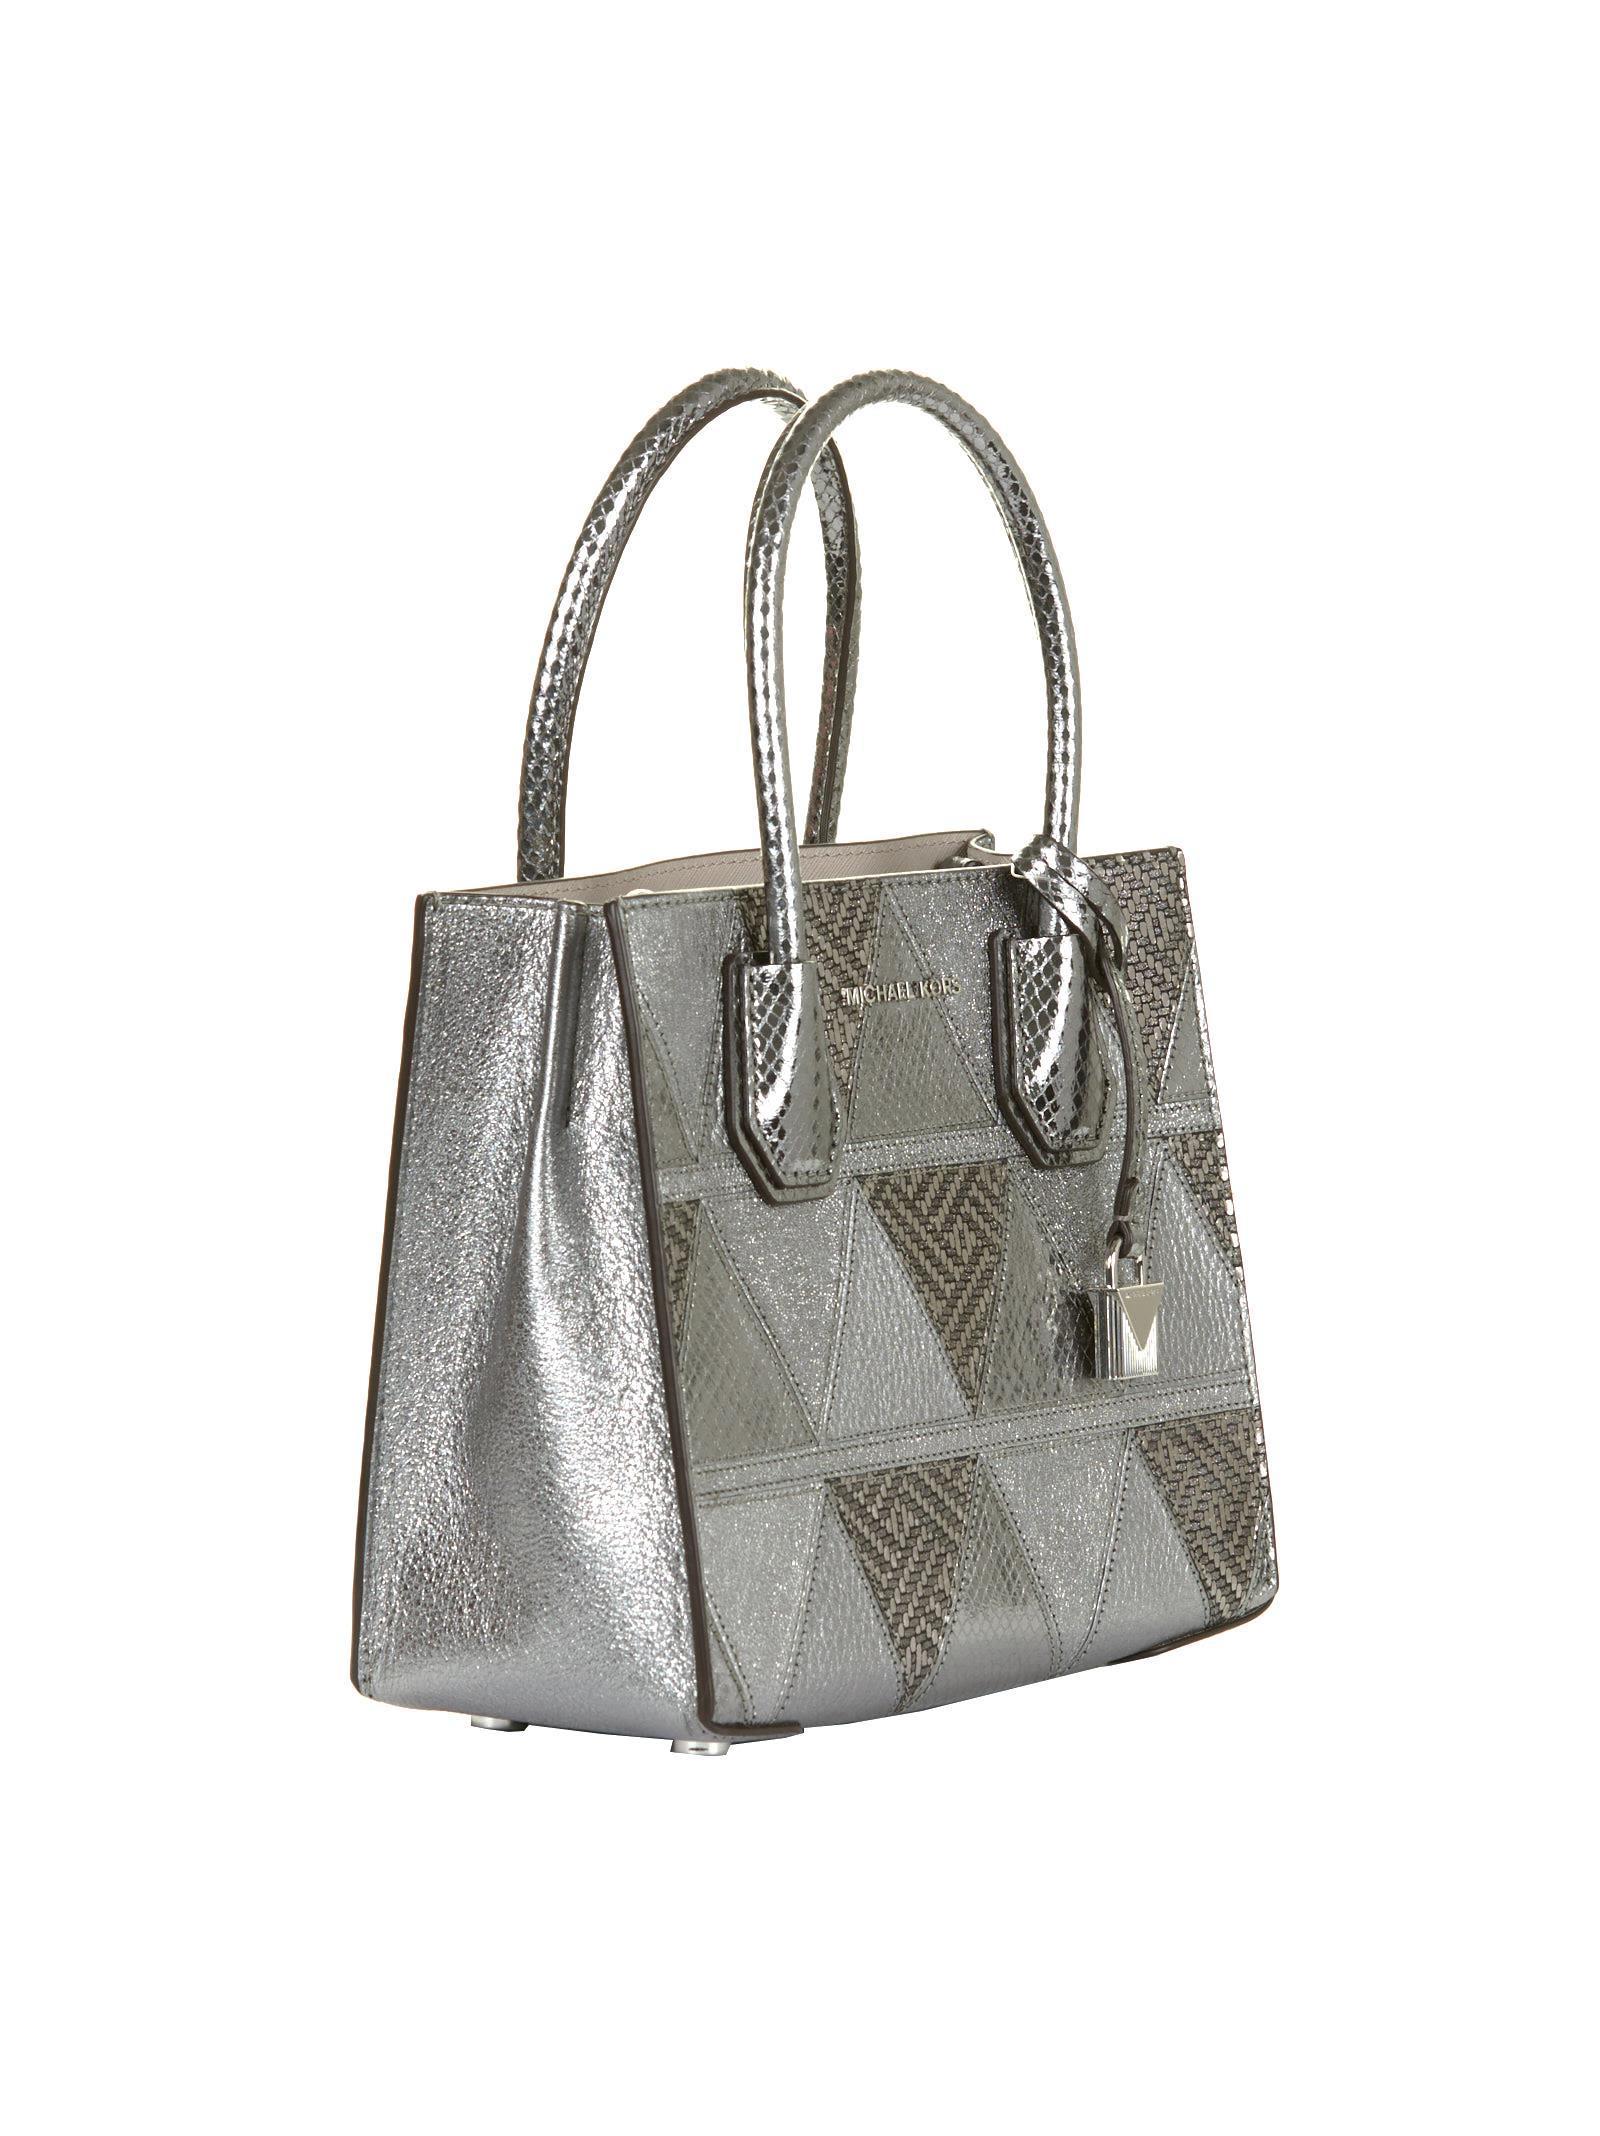 Michael Kors Mercer Metallic Patchwork Crossbody Bag In Silver